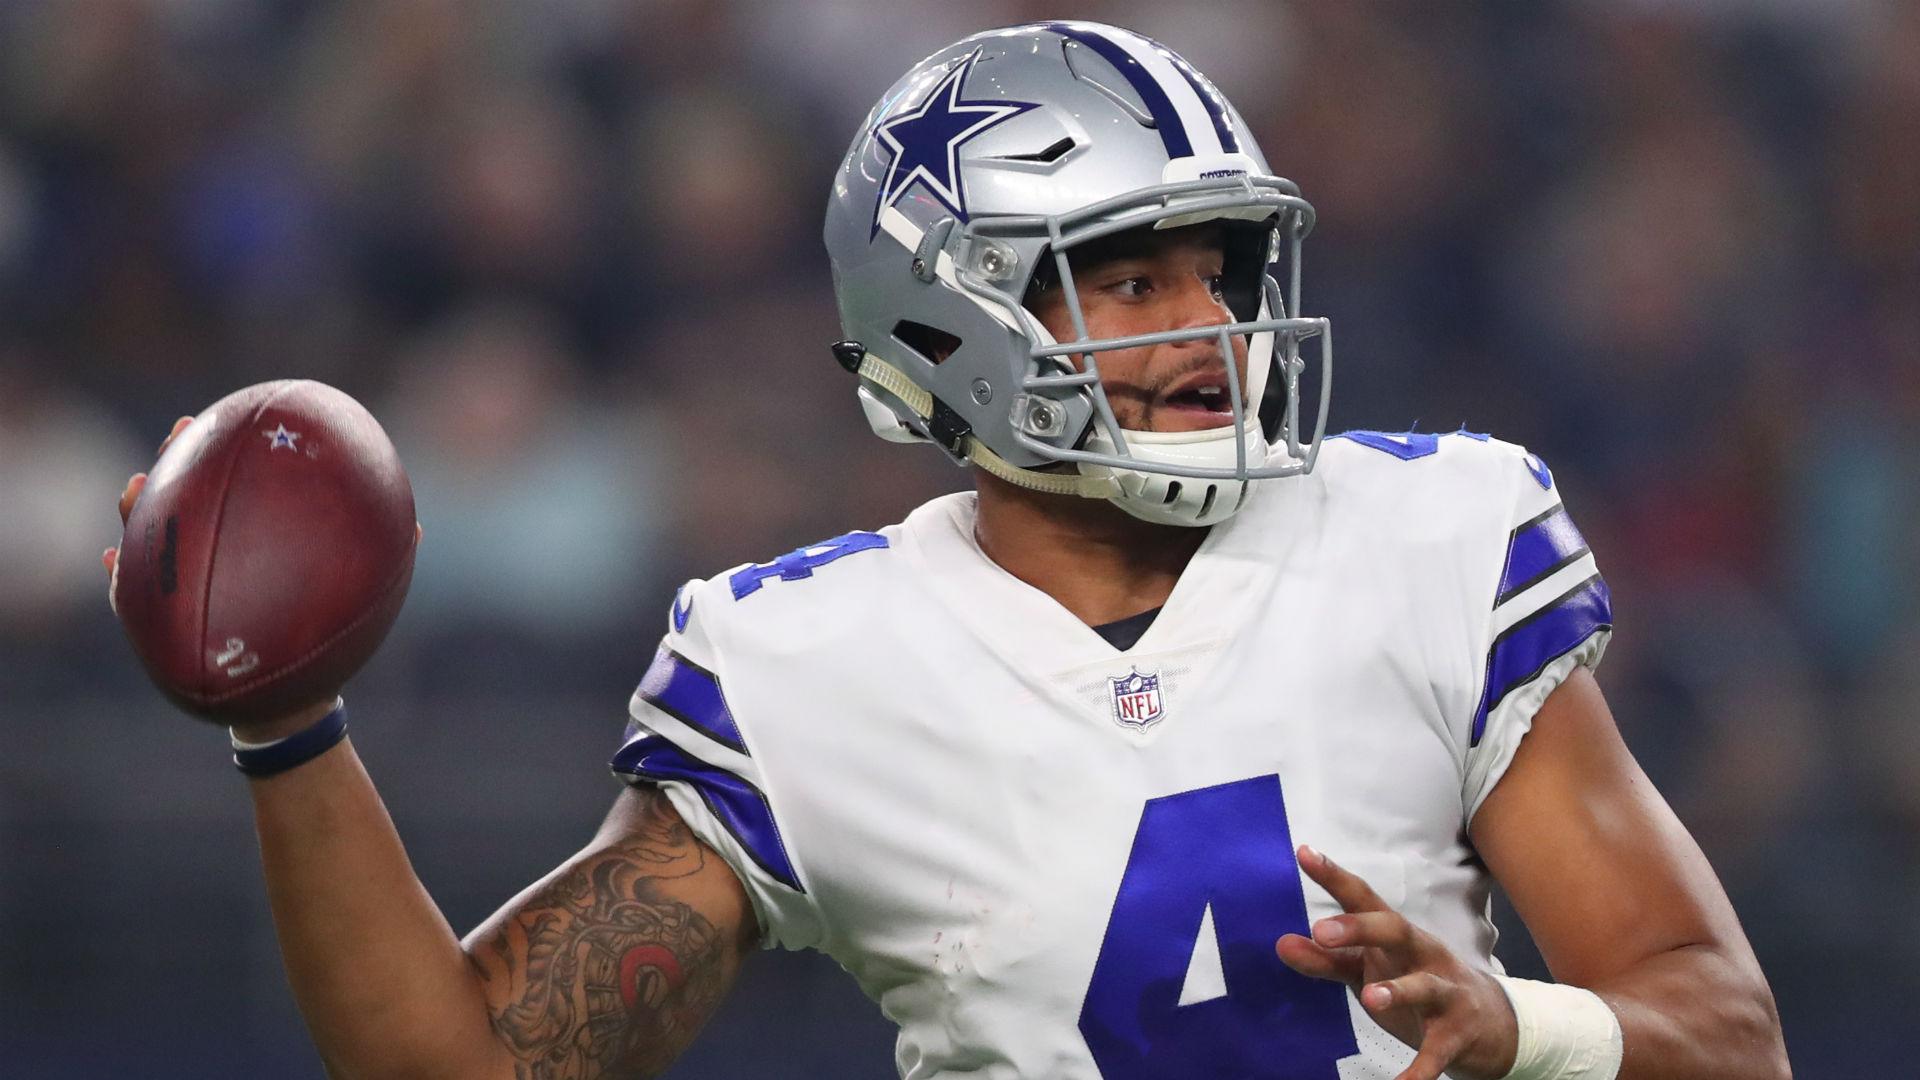 Dallas Cowboys quarterback Dak Prescott discussed the Philadelphia Eagles' trash talk.